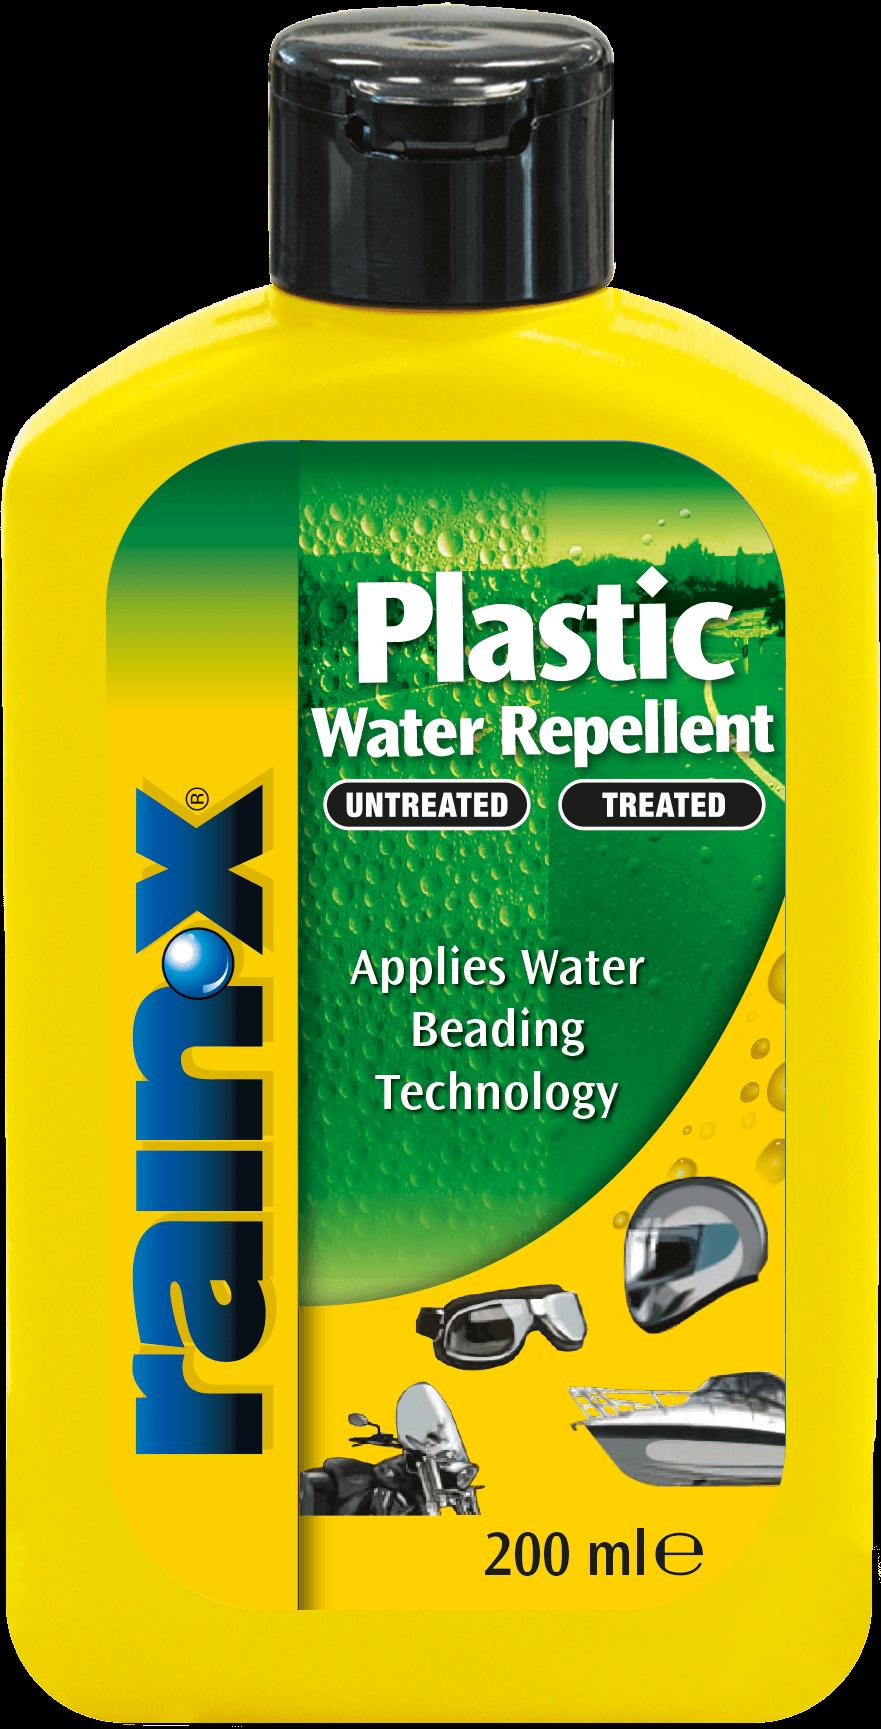 rain x plastic water repellent review